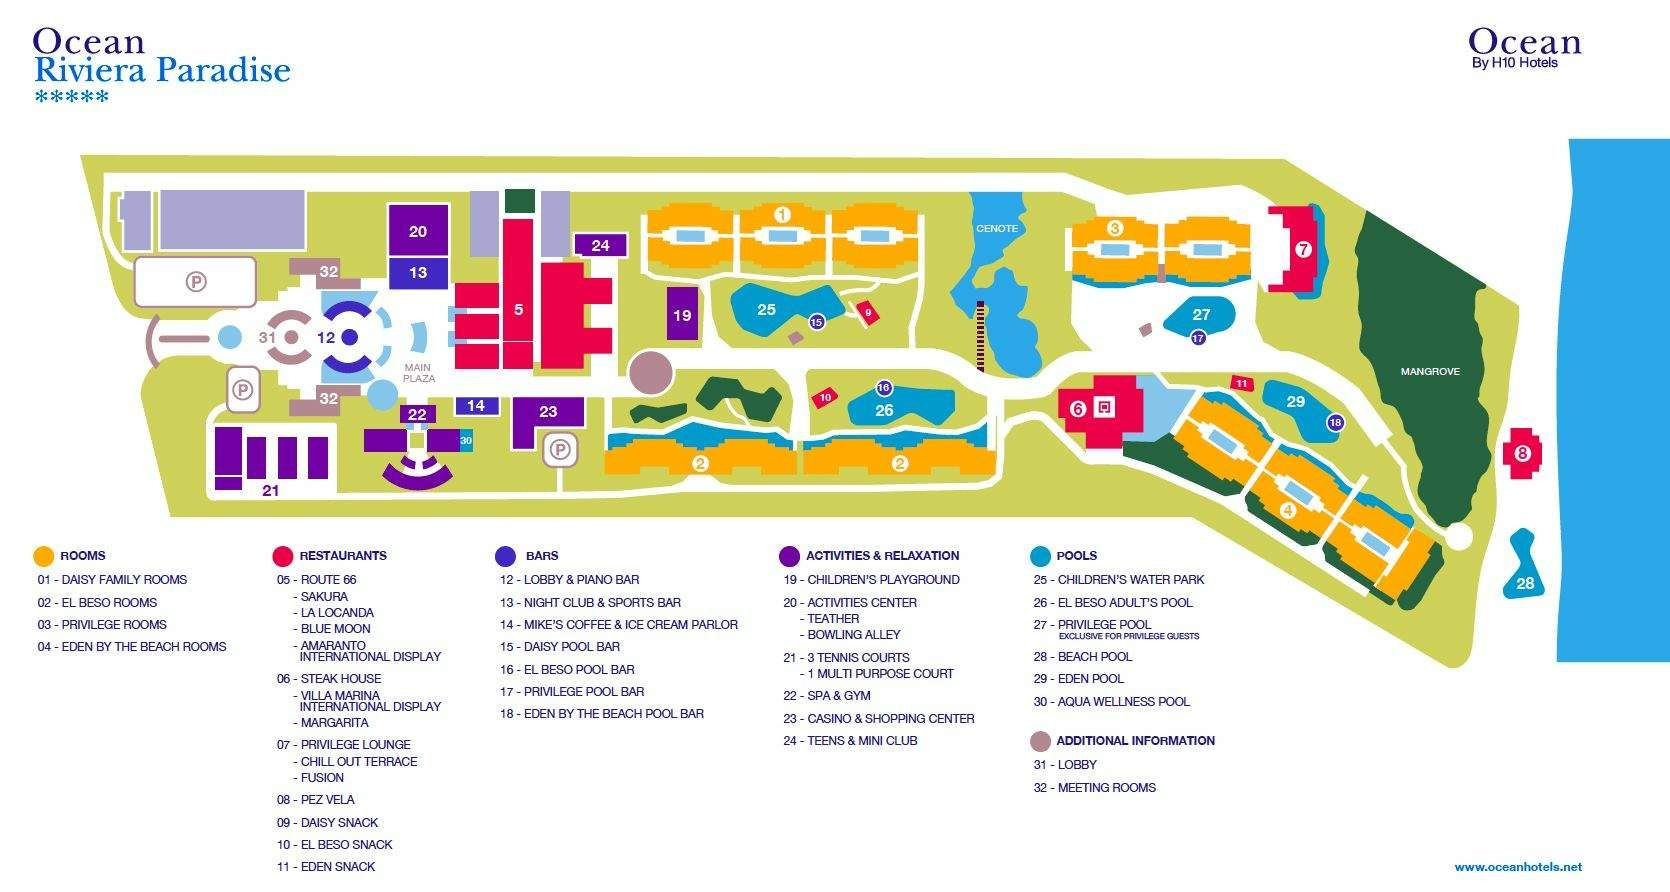 Ocean Riviera Paradise - Resort Map